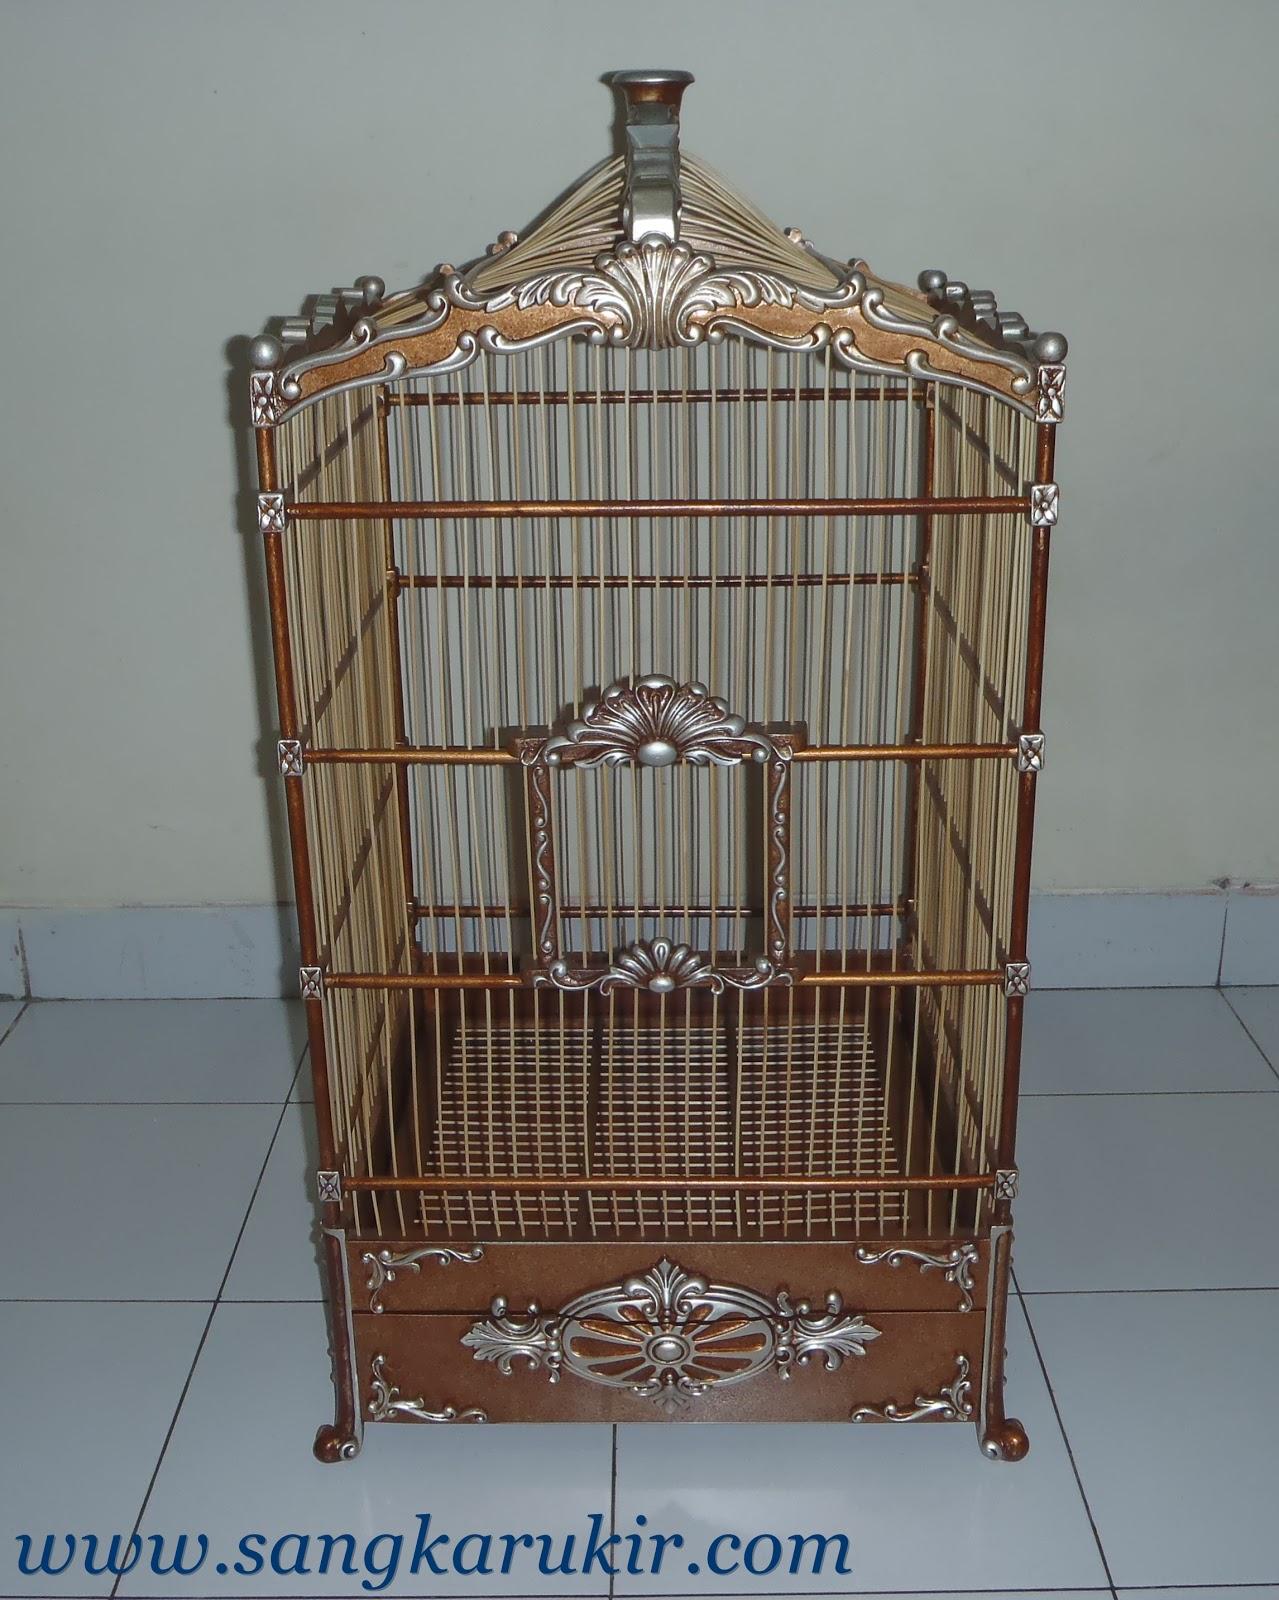 Seputar Sangkar Burung | Jumat, Desember 14, 2012 | 0komentar